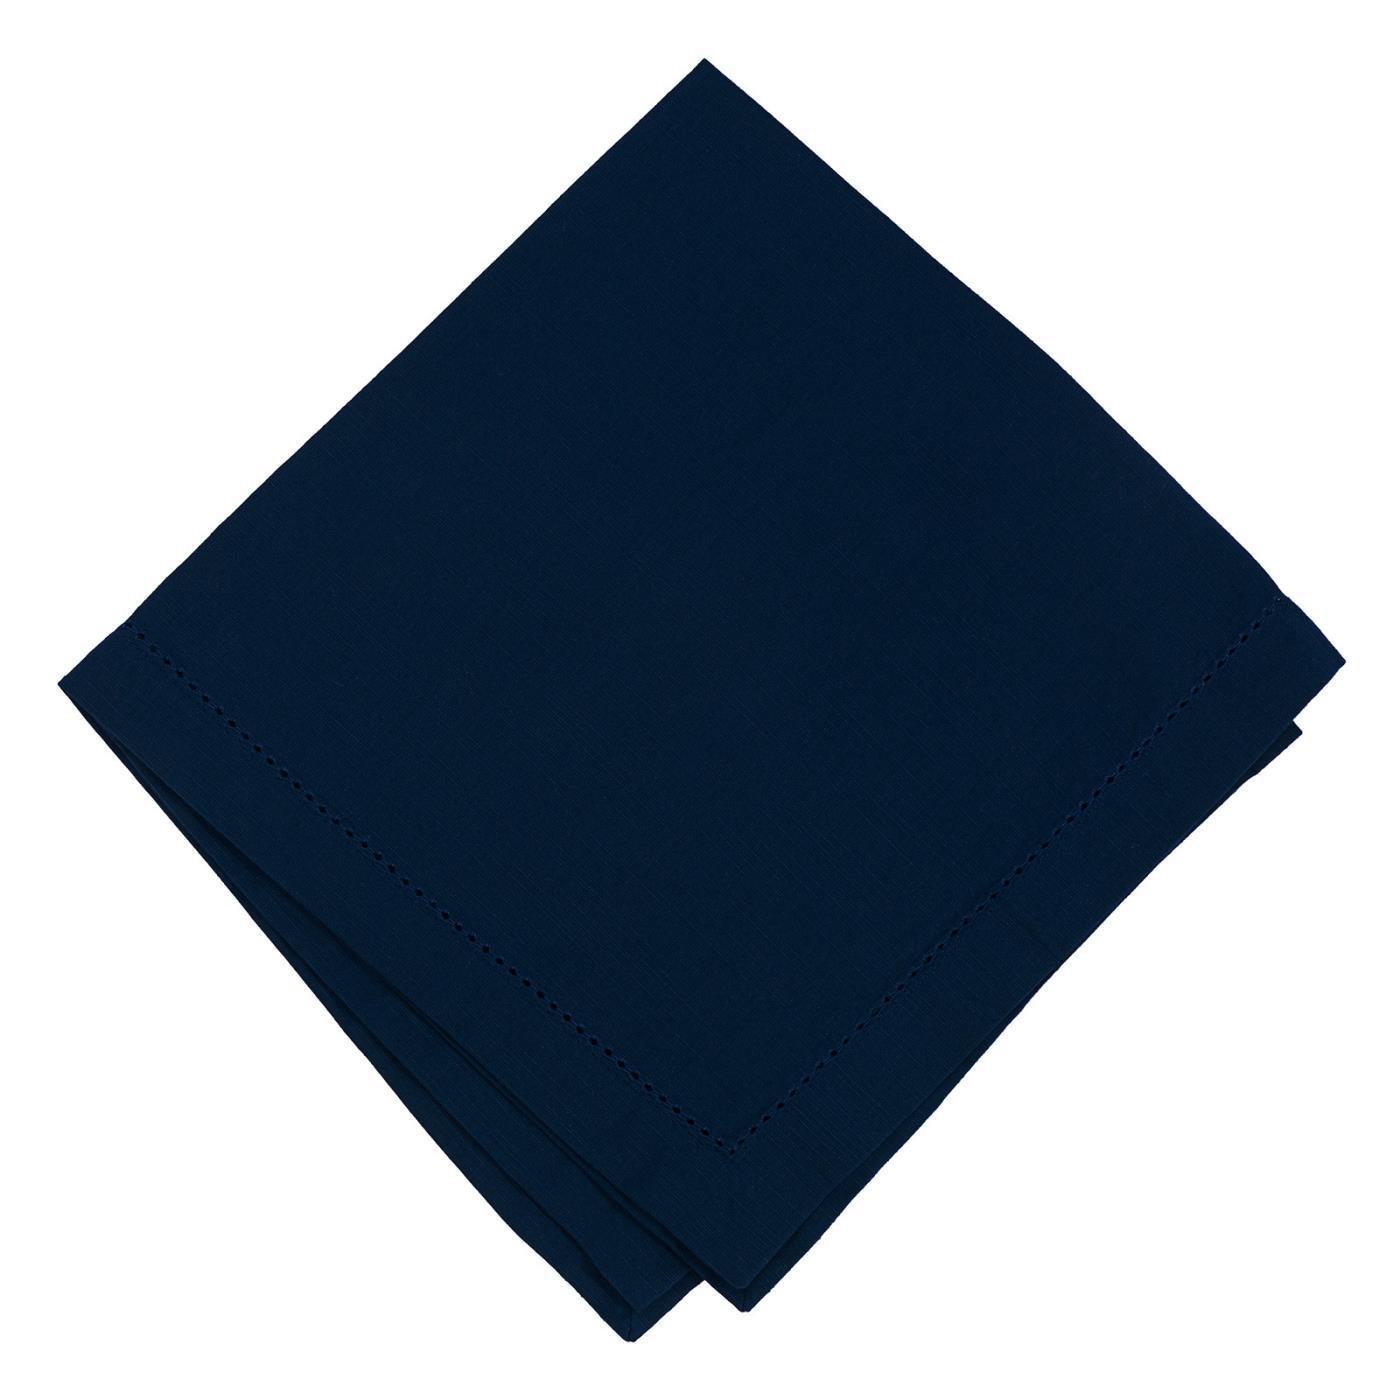 Navy - Linen - Hemstitched